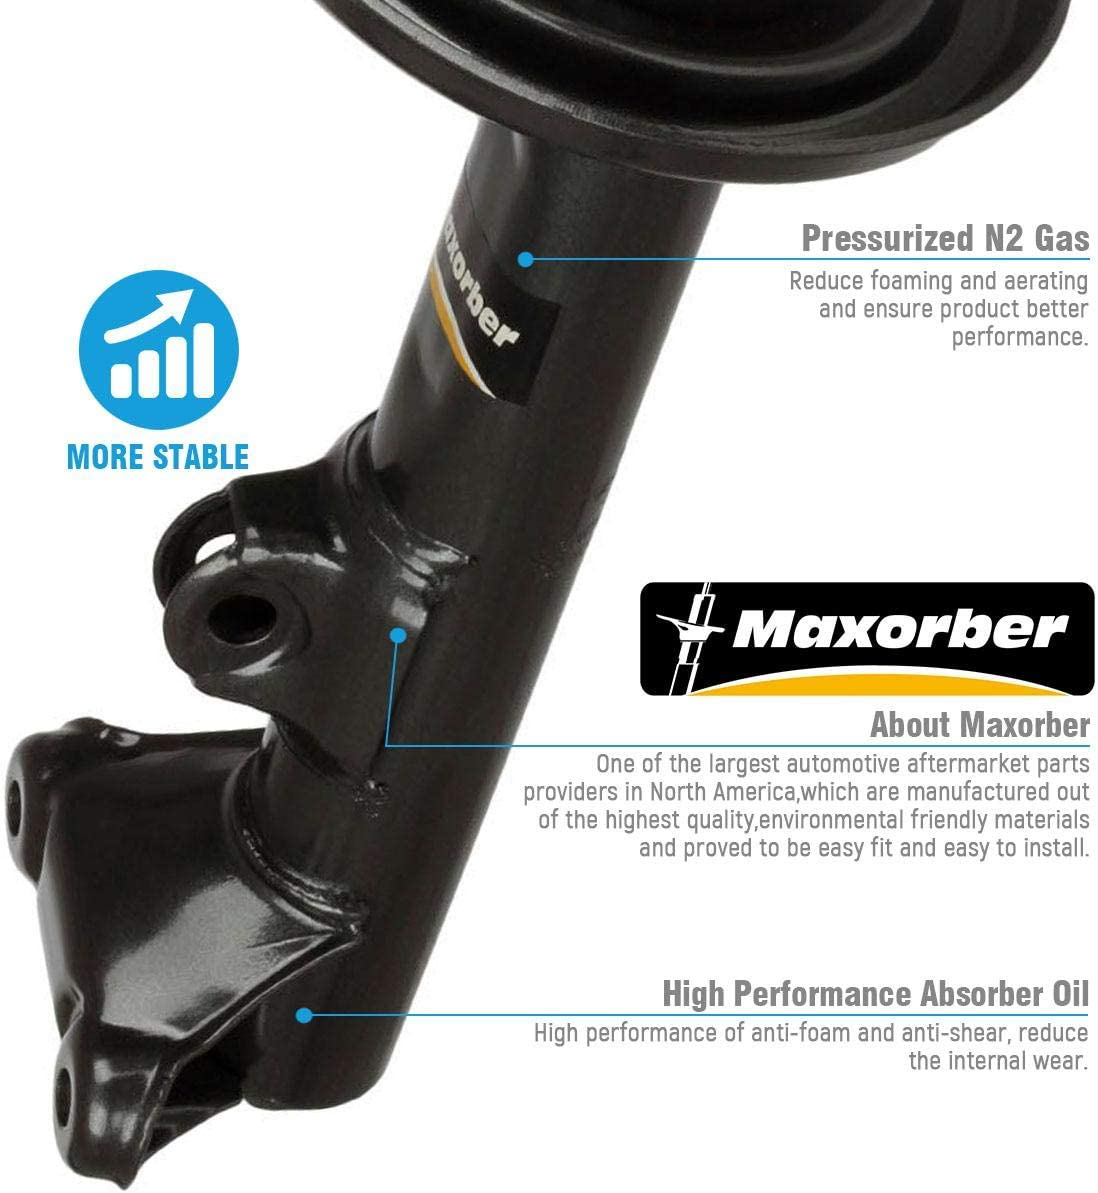 Maxorber Front Pair Shocks Struts Absorber Compatible with Mercedes-Benz C230 C350 C280 C55 AMG C240 C320 01-09 Shocks Absorber 335920 71488